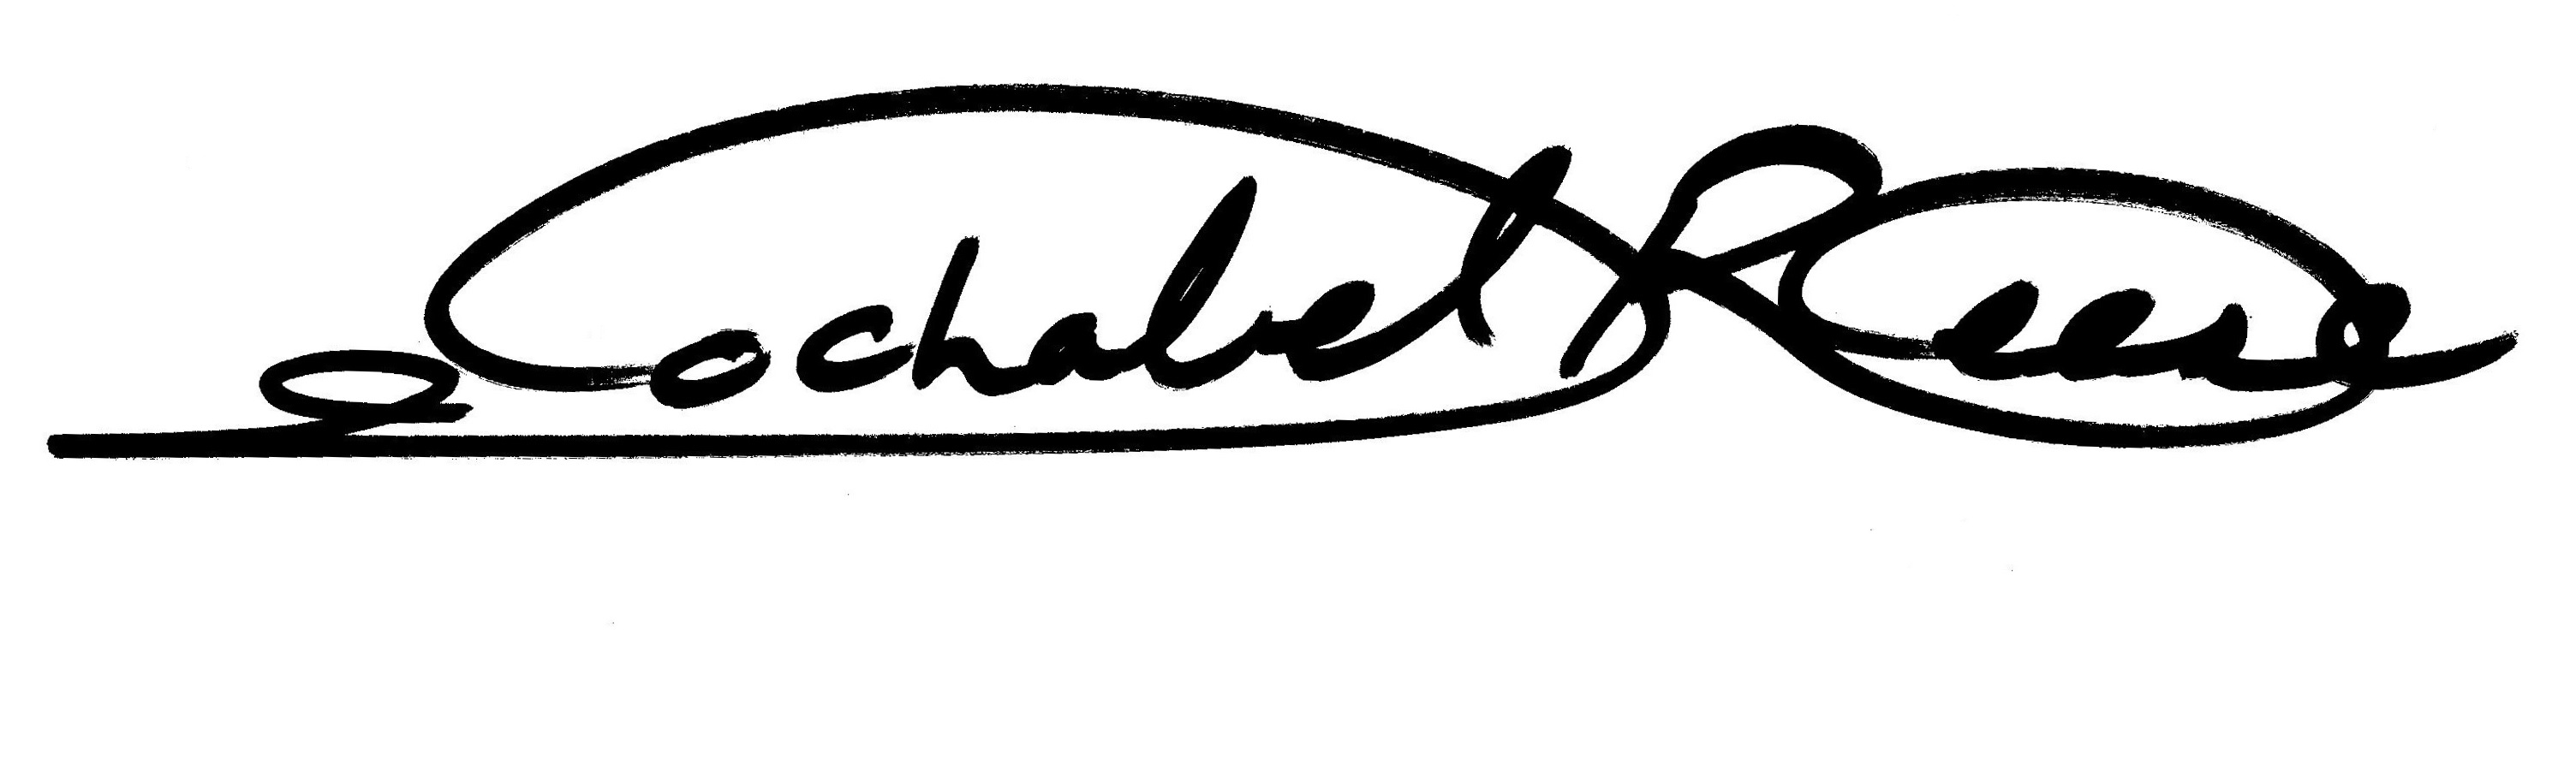 Jochabel Reese's Signature